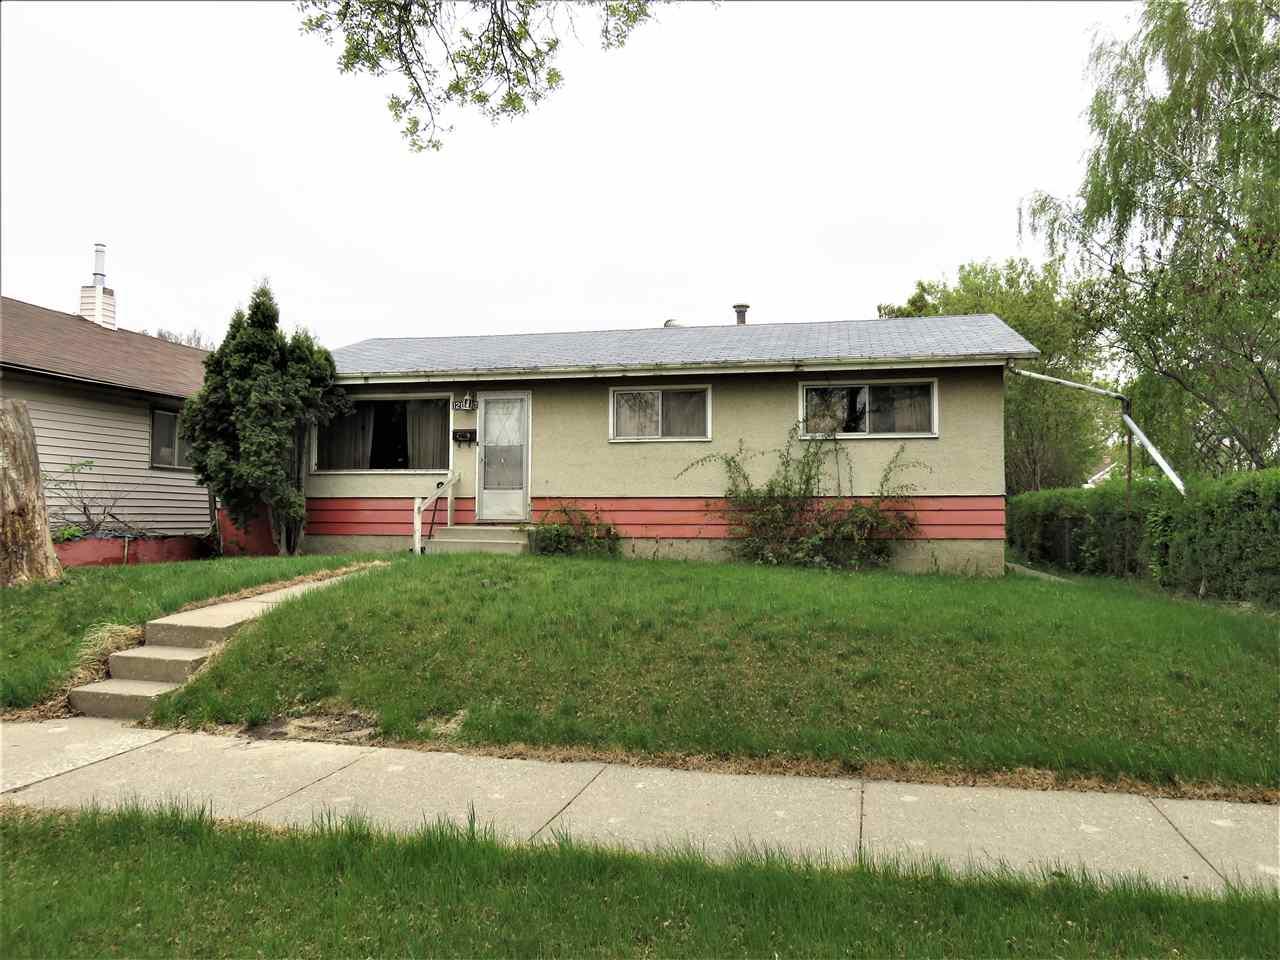 For Sale: 12010 39 Street, Edmonton, AB | 4 Bed, 1 Bath House for $199,000. See 9 photos!